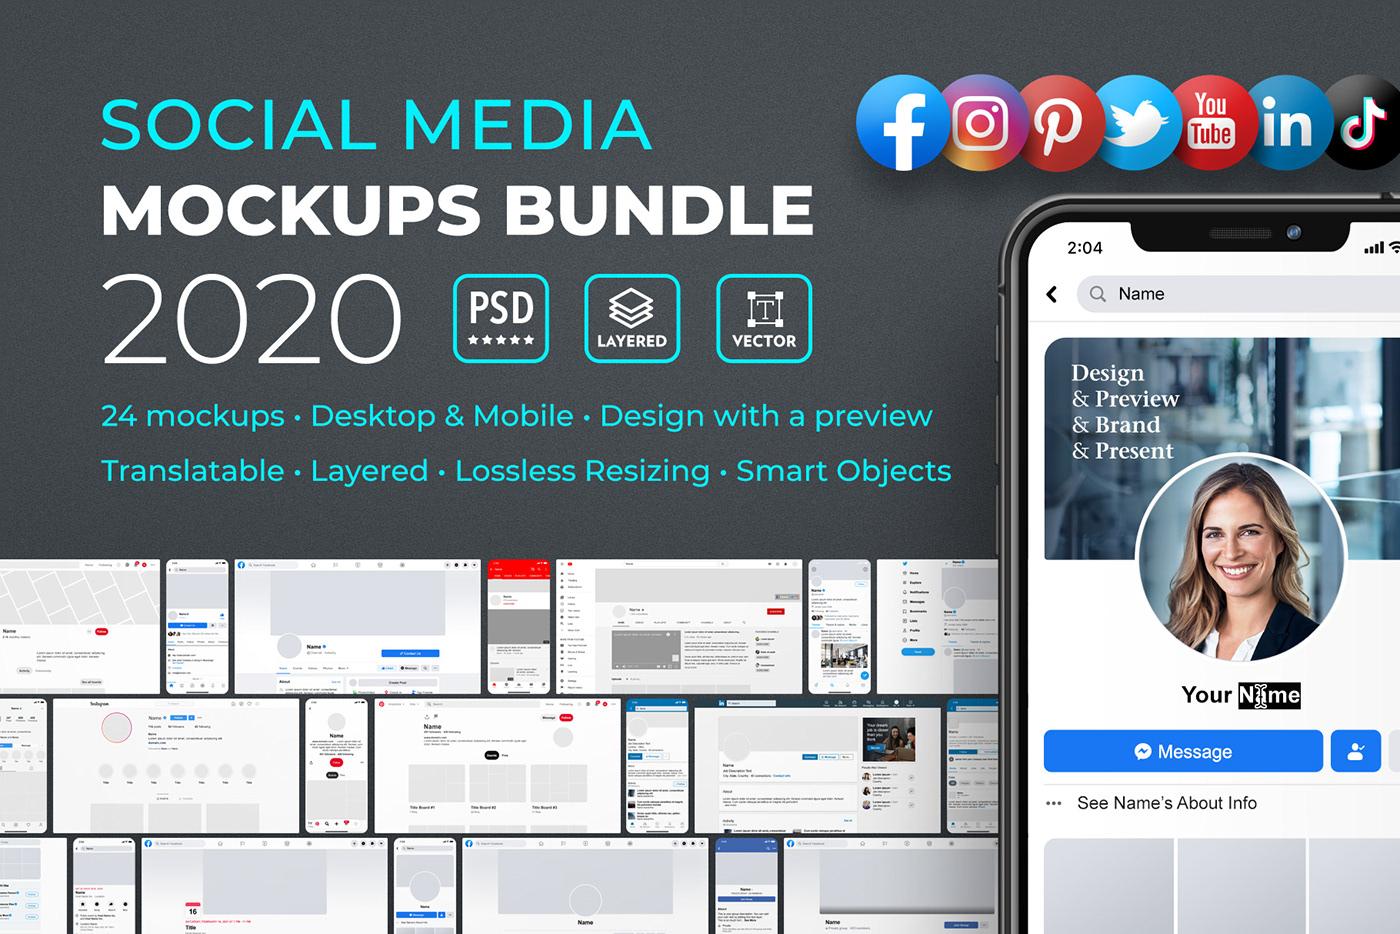 Free Facebook Profile Mockup 2020 - Photoshop Template on ...